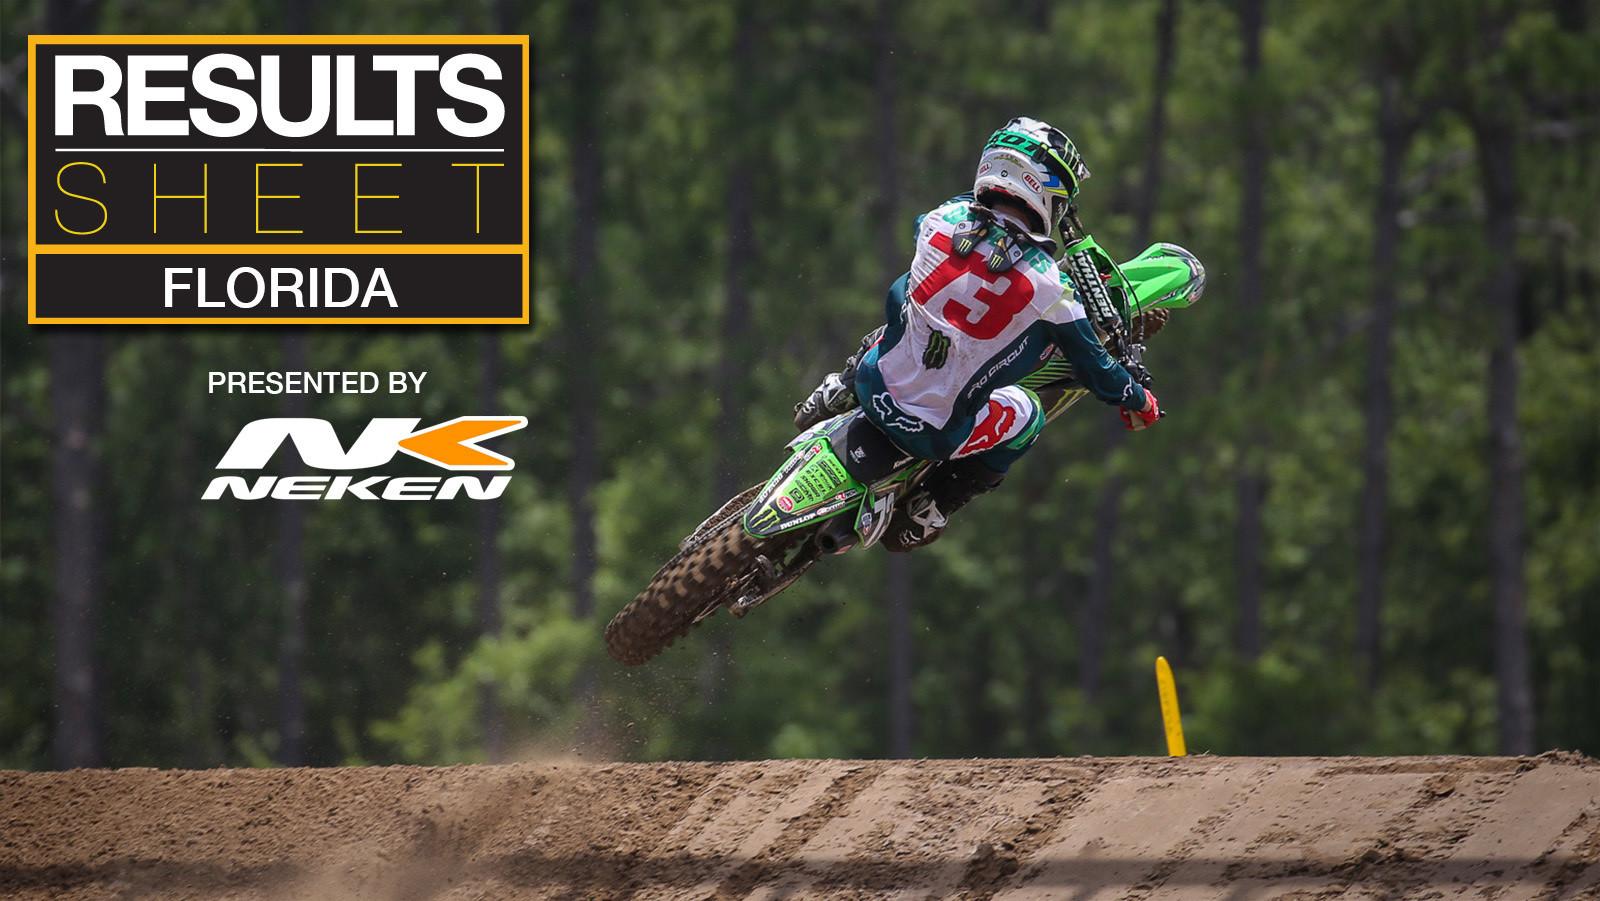 Results Sheet: 2019 Florida Motocross National